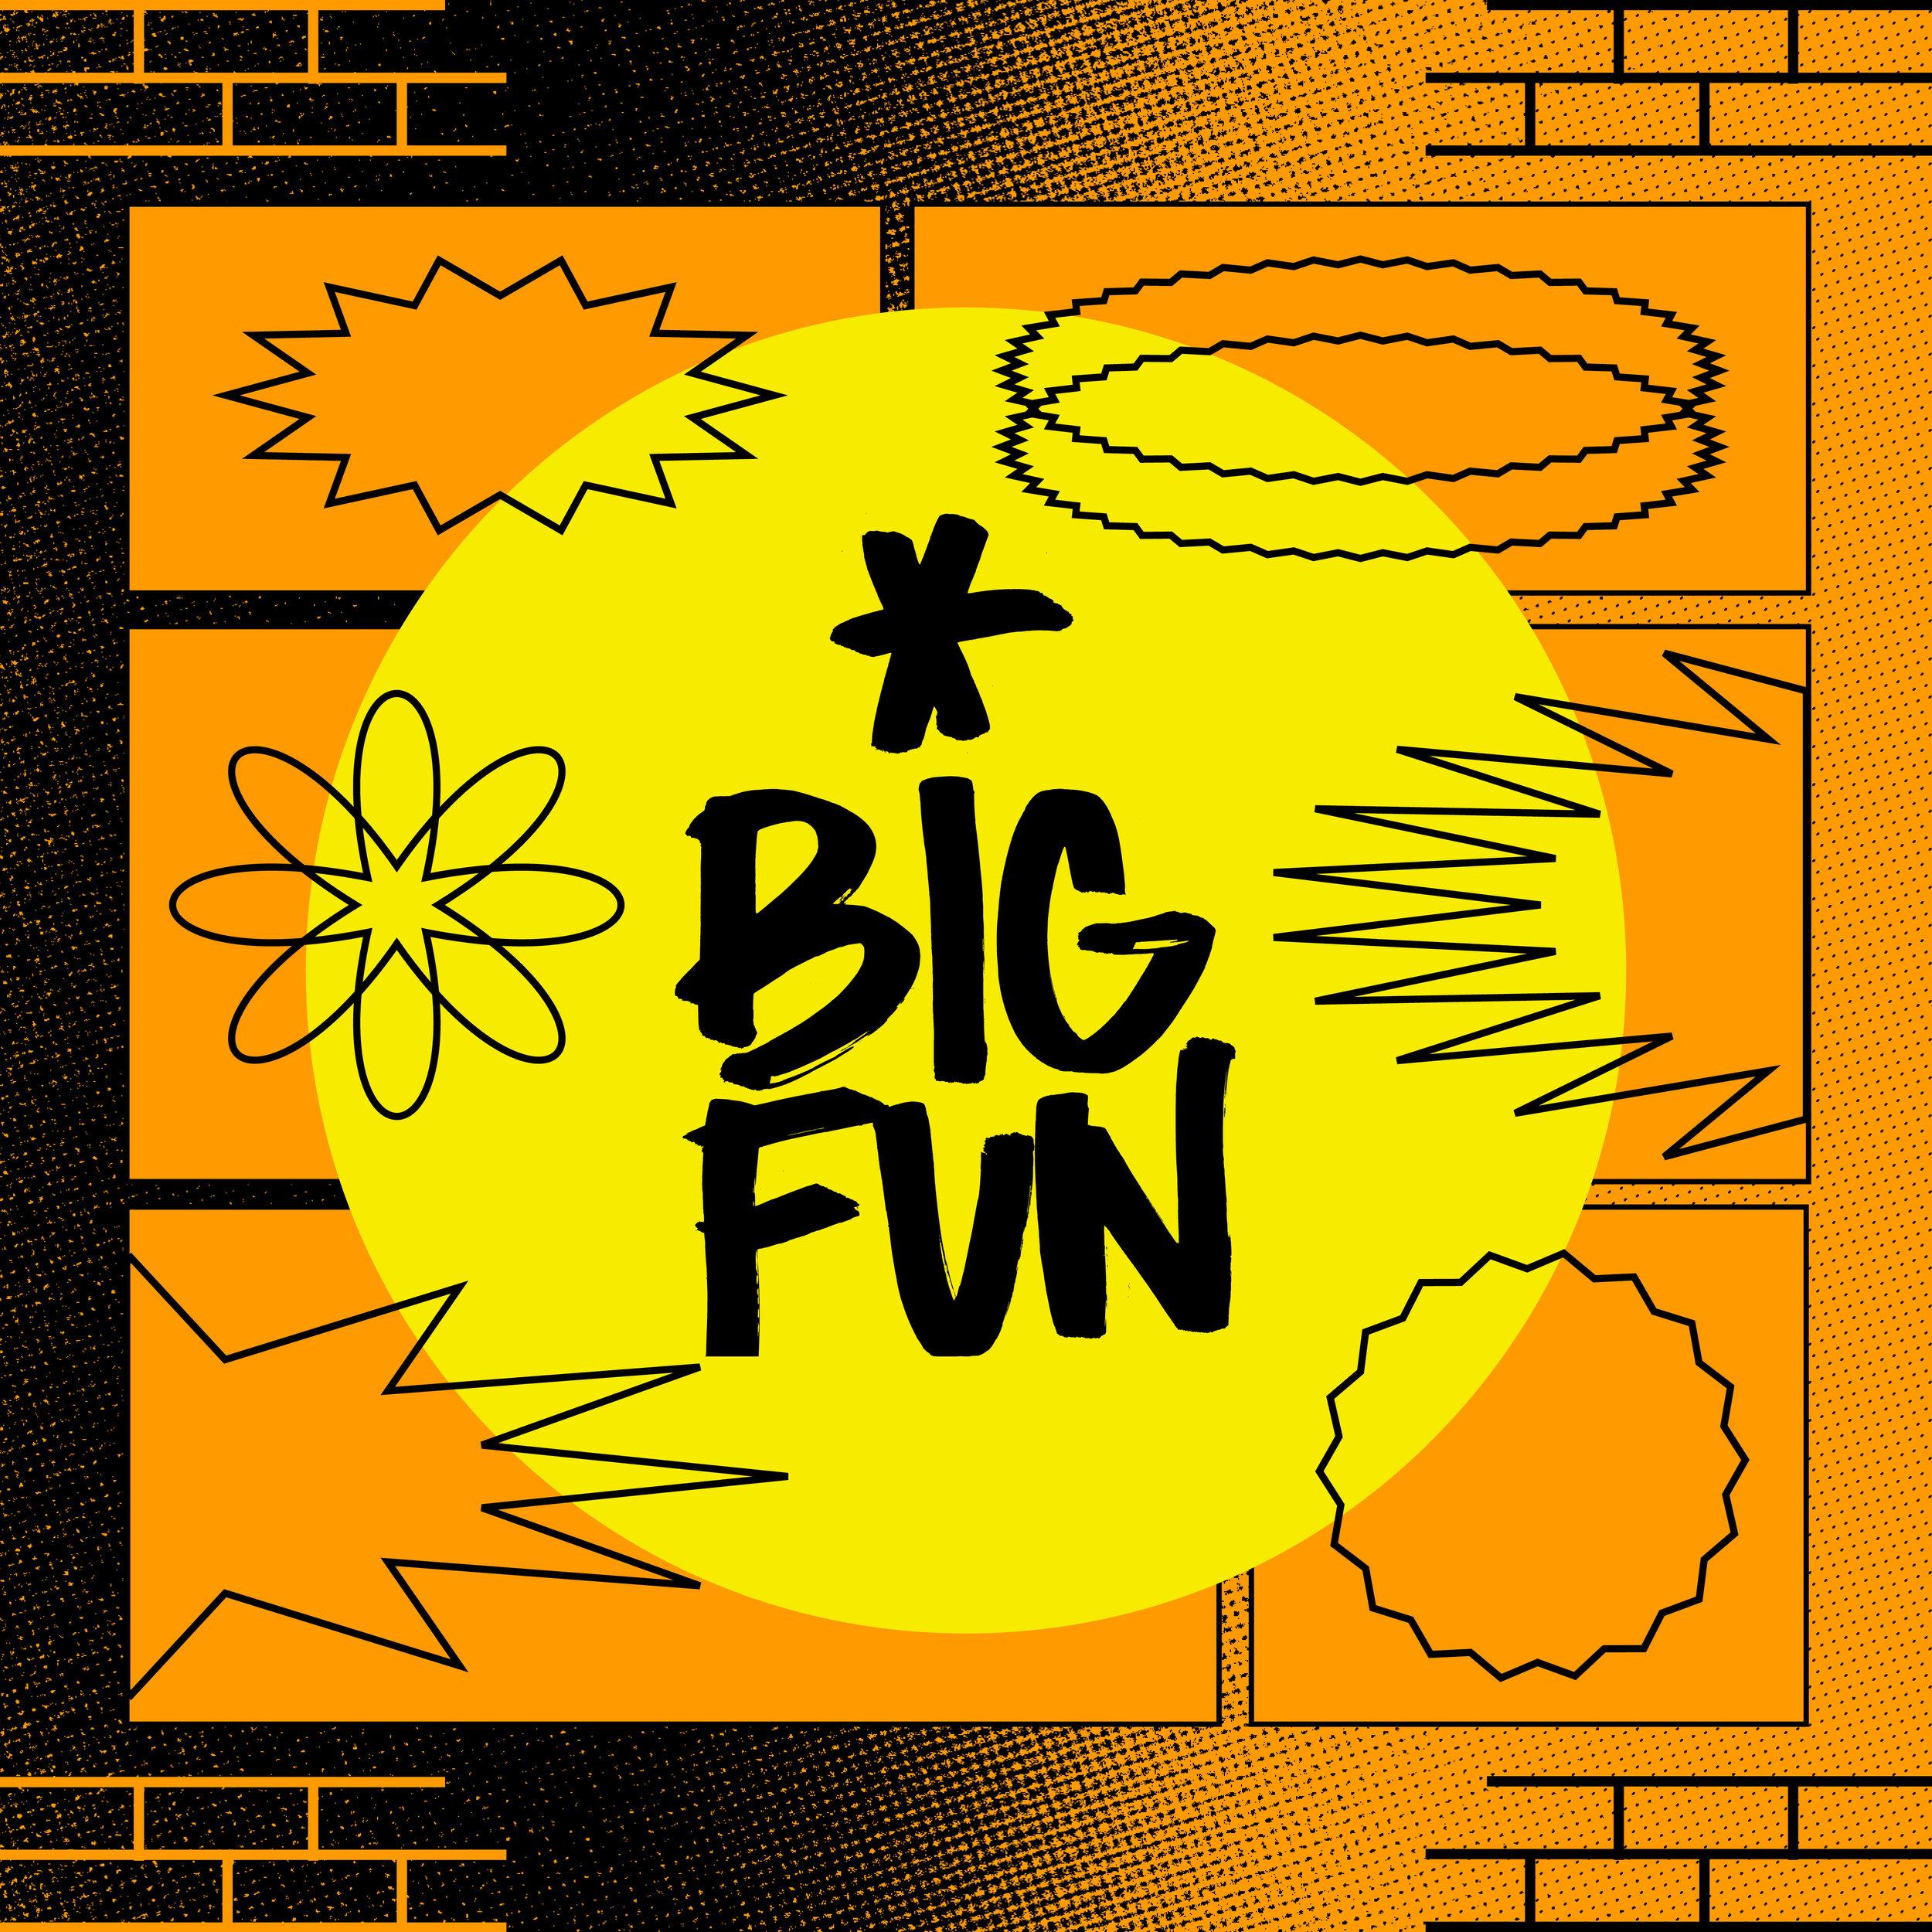 01-BIGFUN-GENERALBIGFUN-INSTAGRAM.jpg